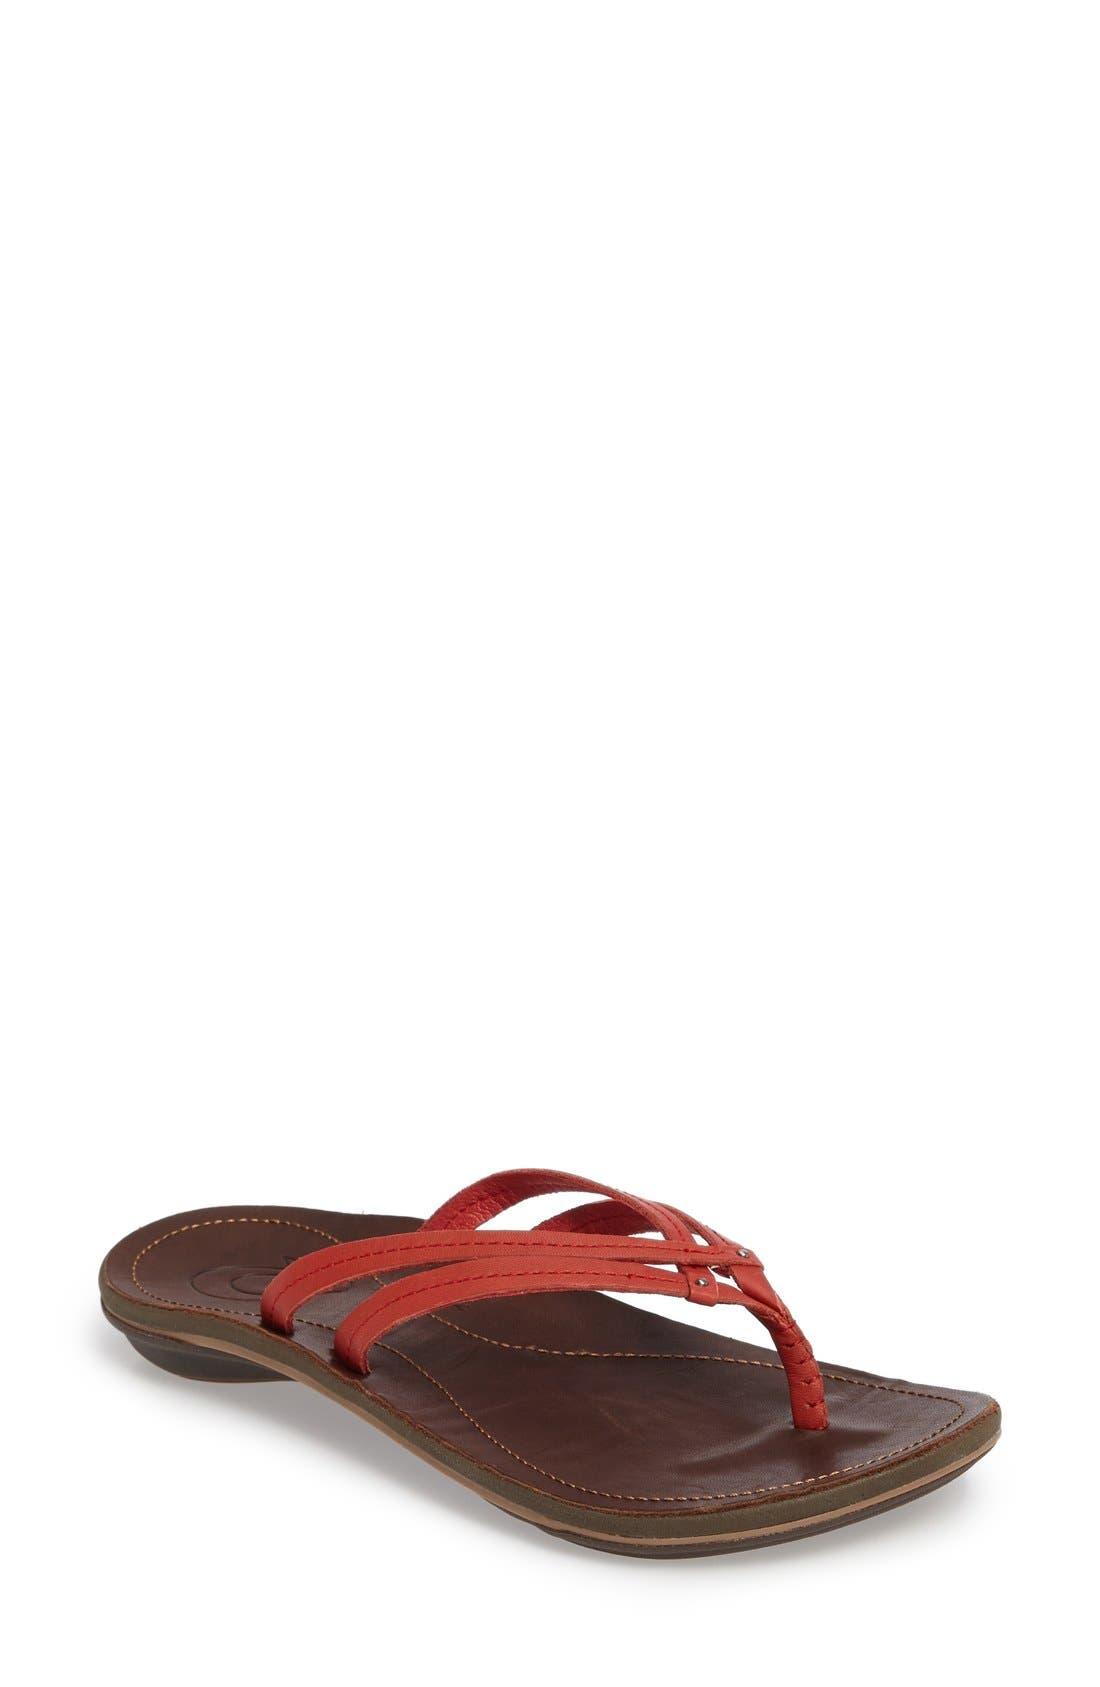 OluKai 'U'i' Thong Sandal (Women)